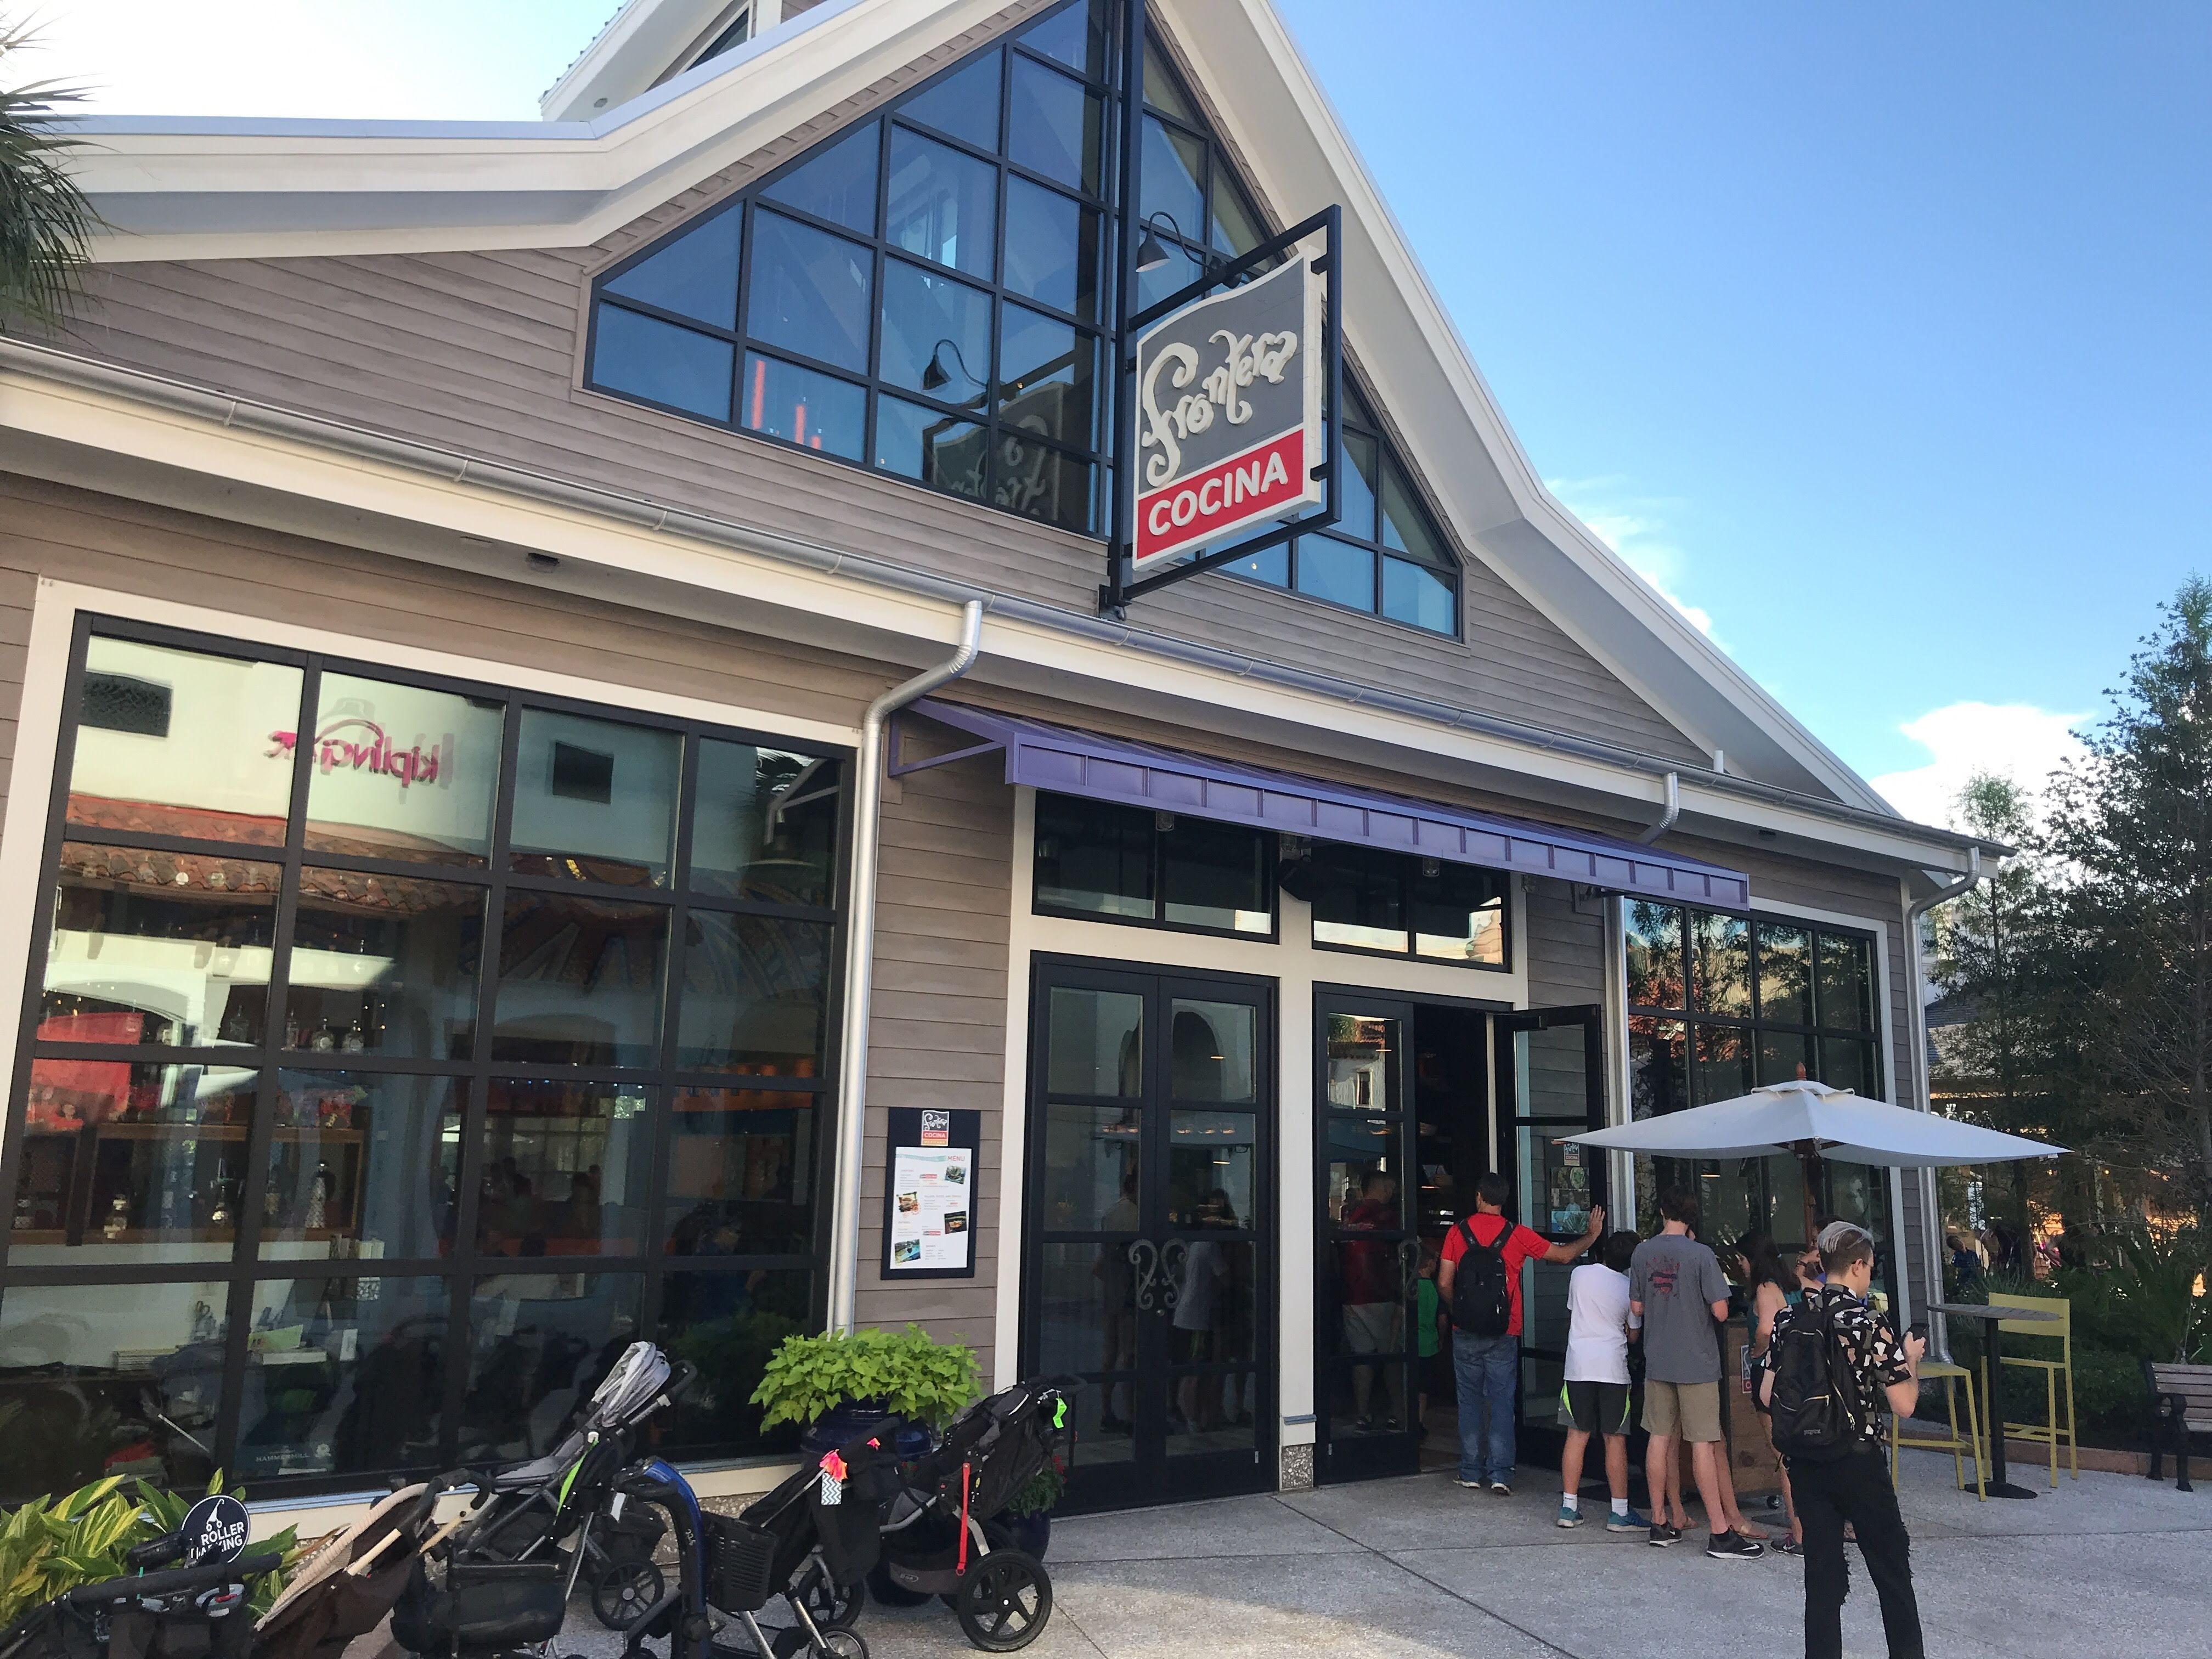 Frontera Cocina - Lake Buena Vista | Restaurant Review - Zagat